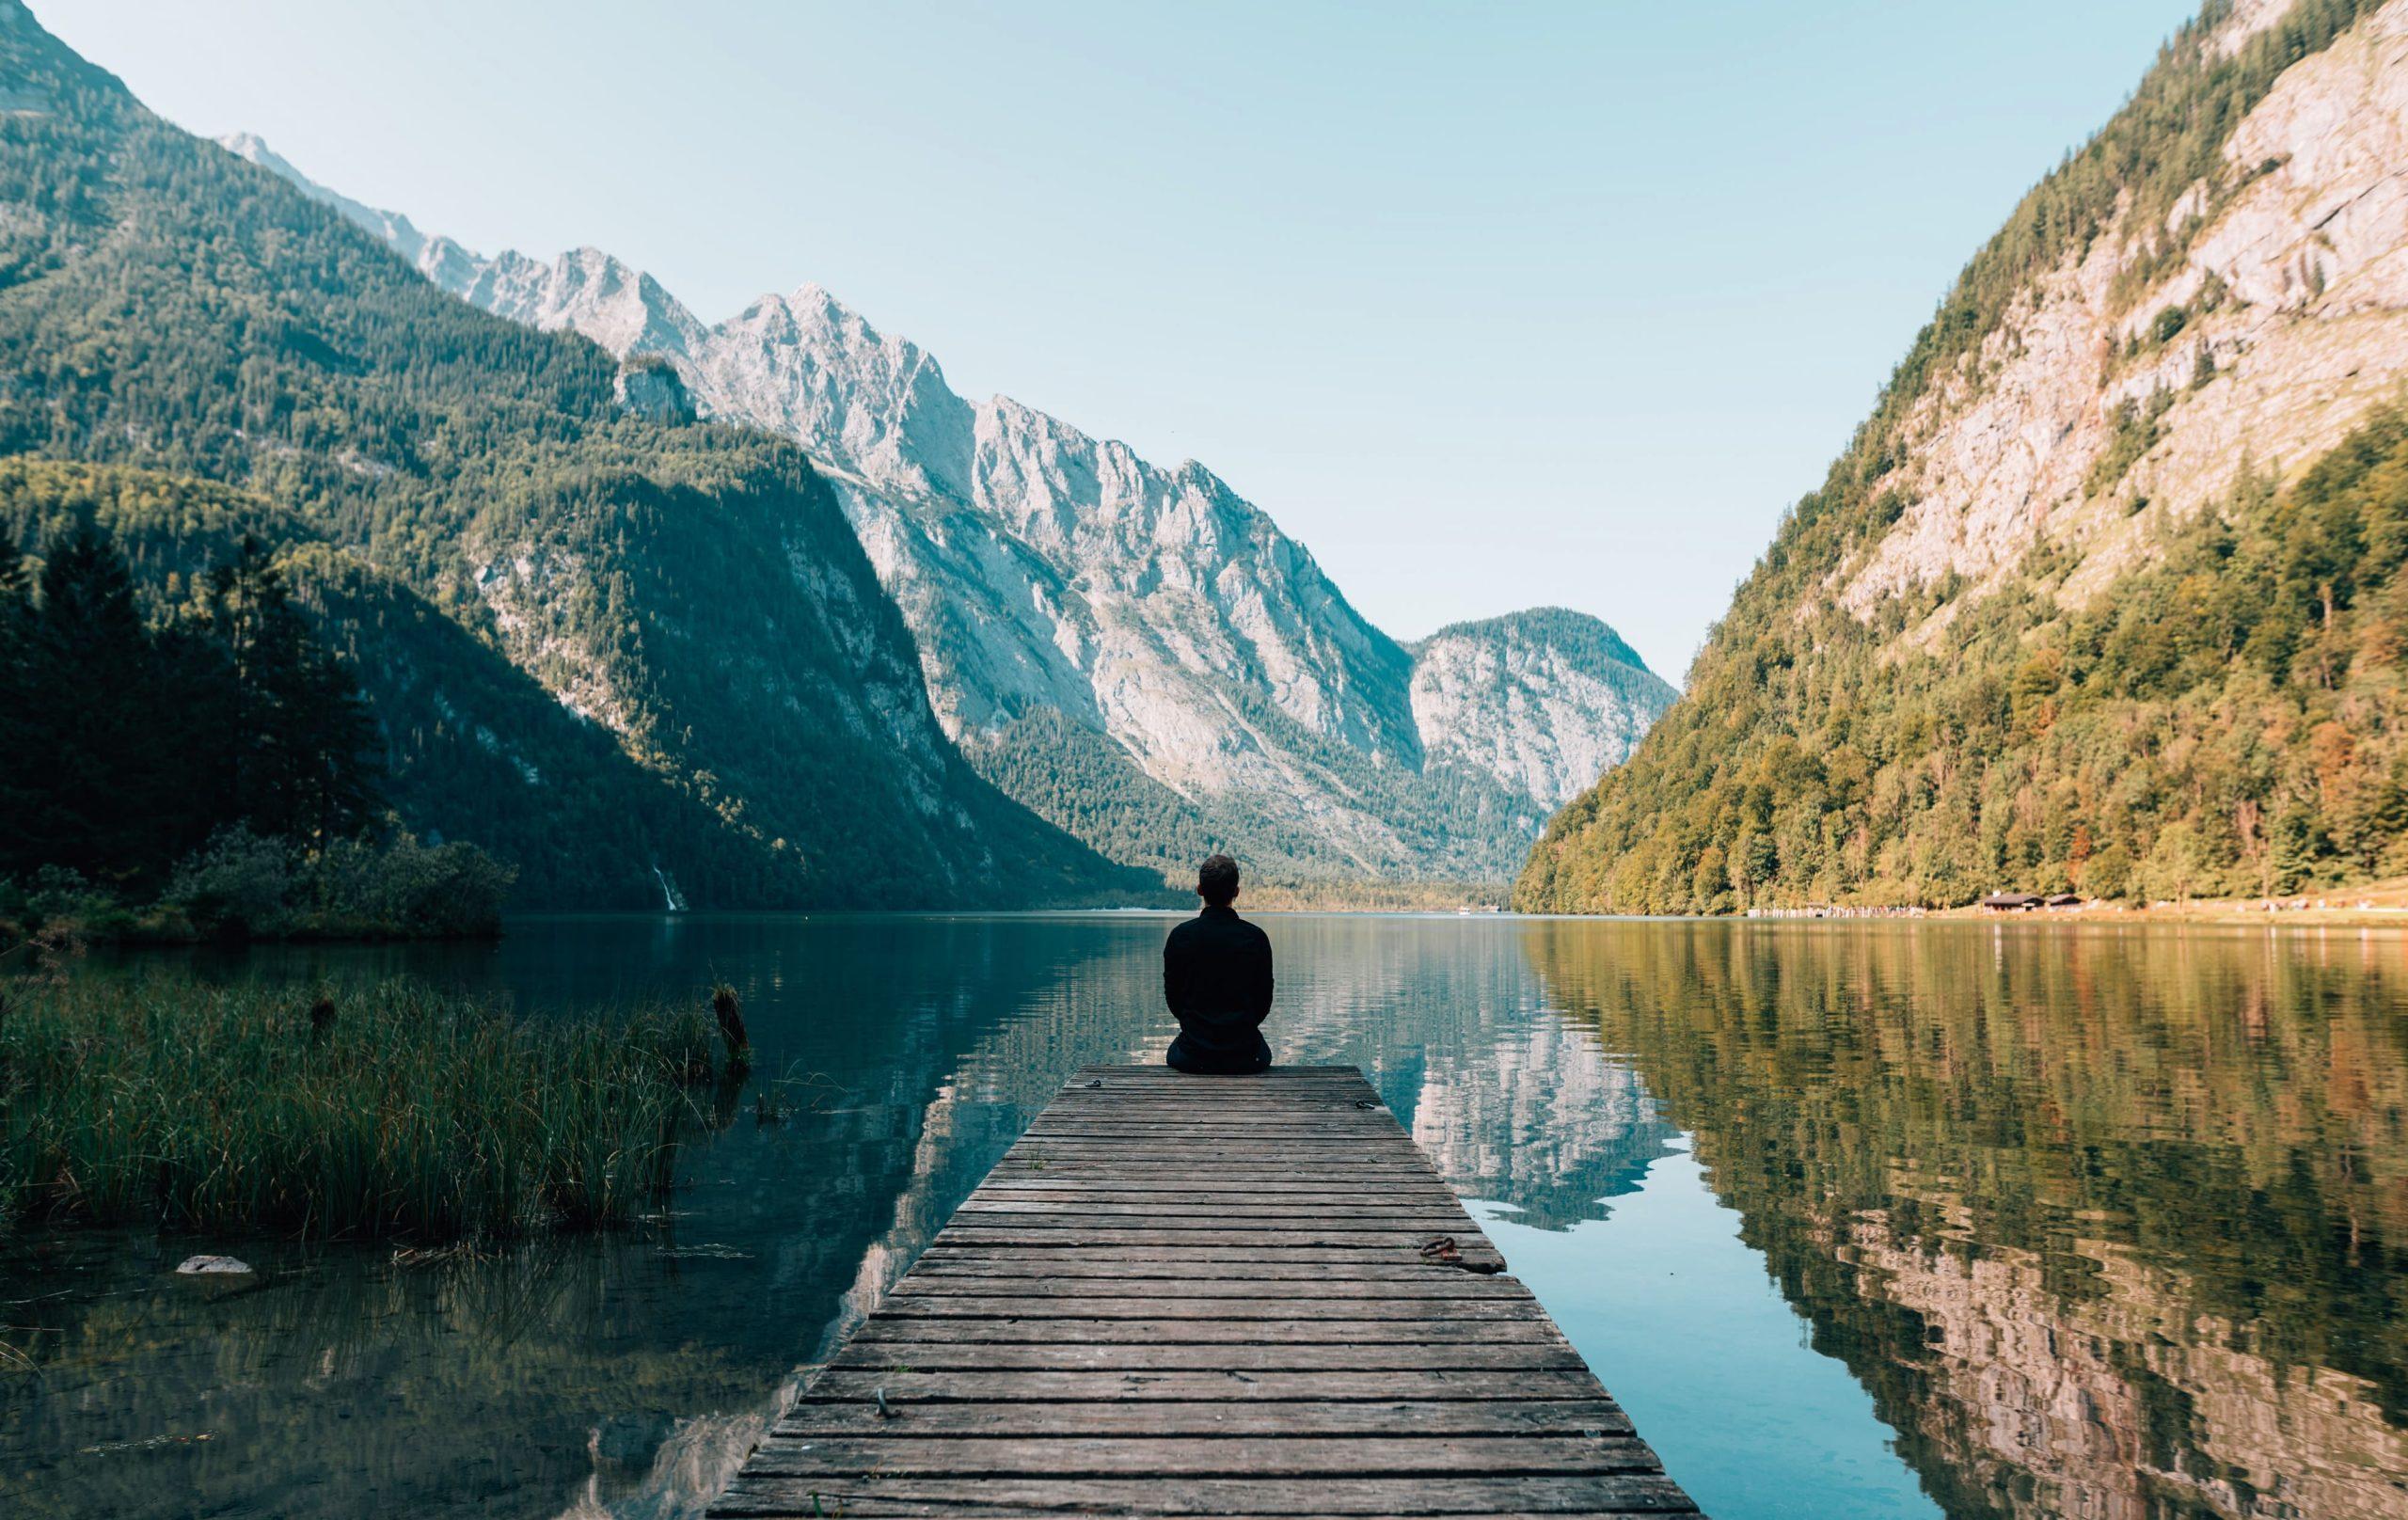 mindfulness taster class